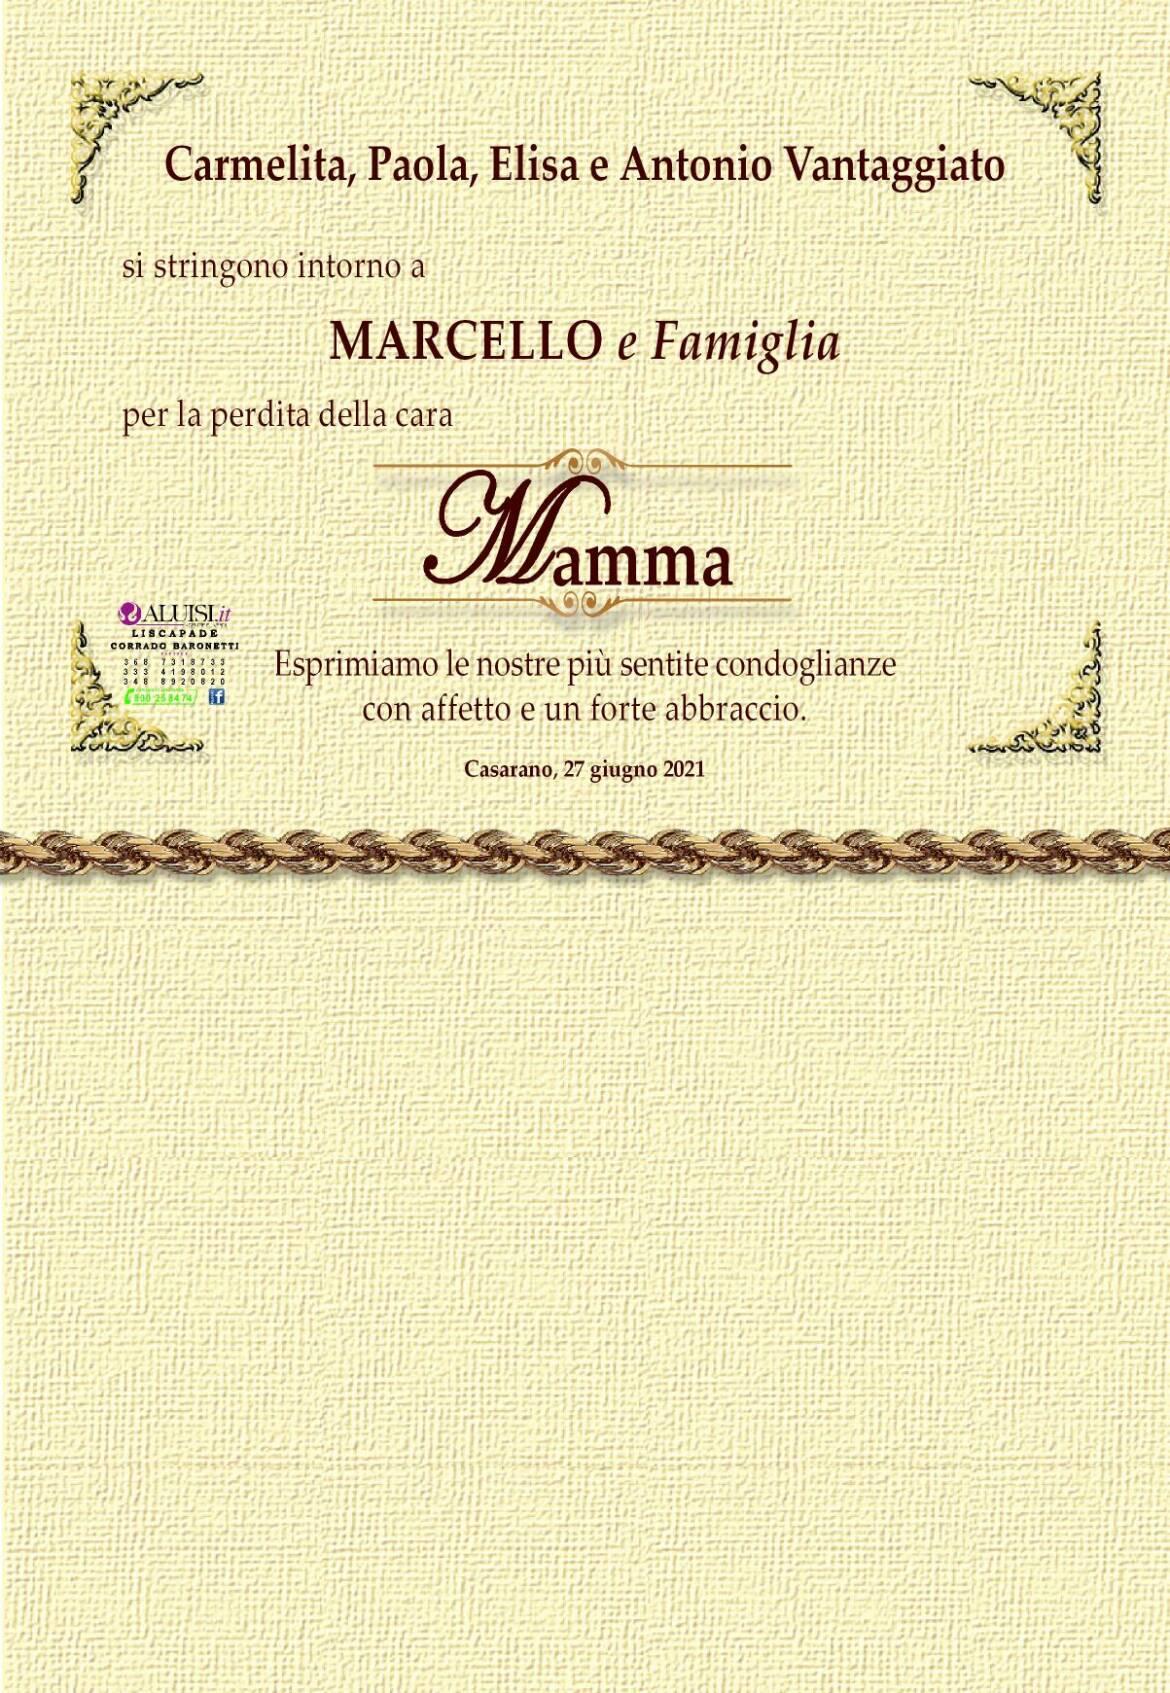 partceipazioni-rosaria-casarano-4.jpg